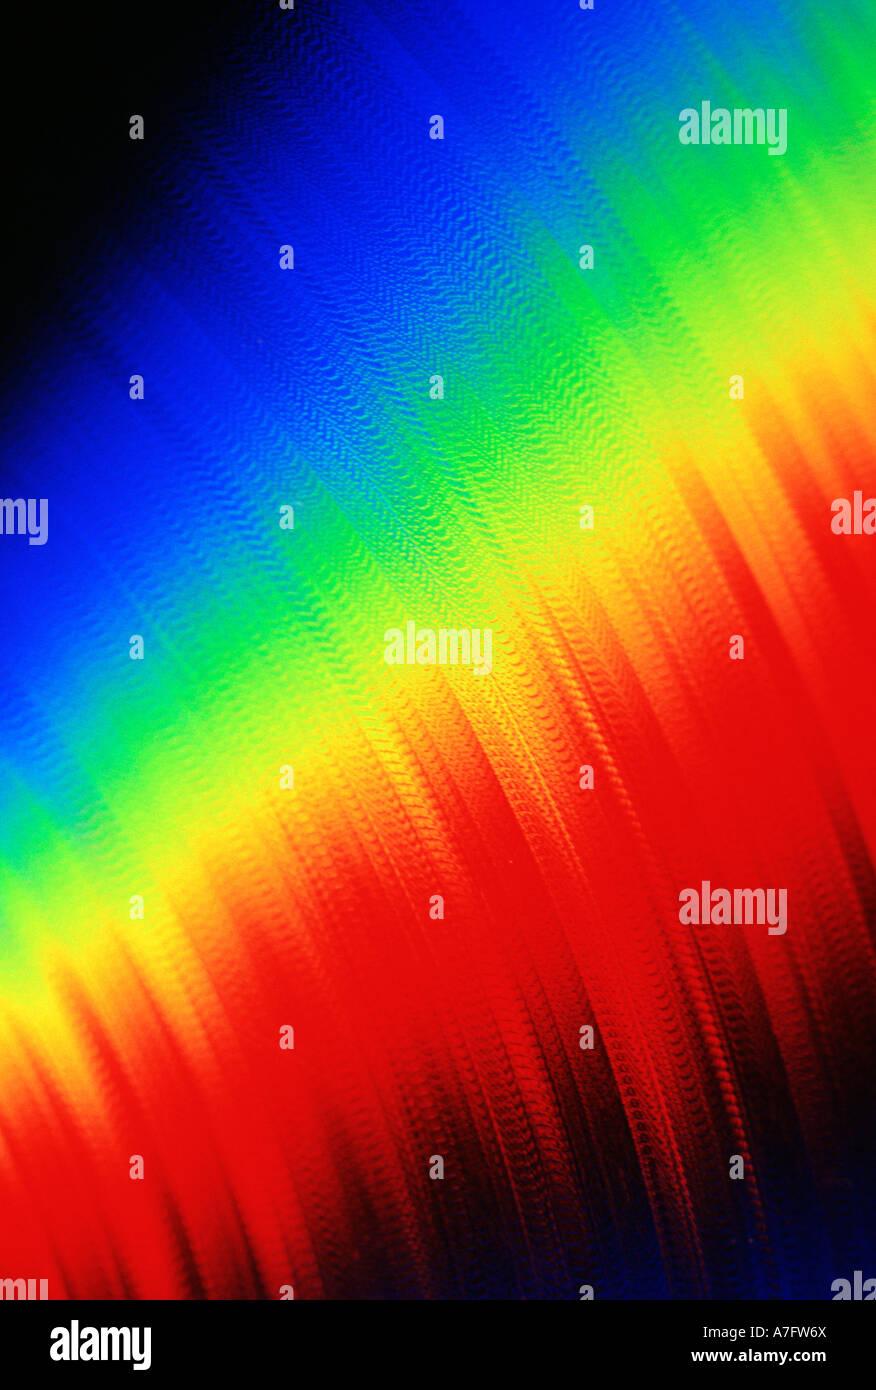 spectrum vertical - Stock Image